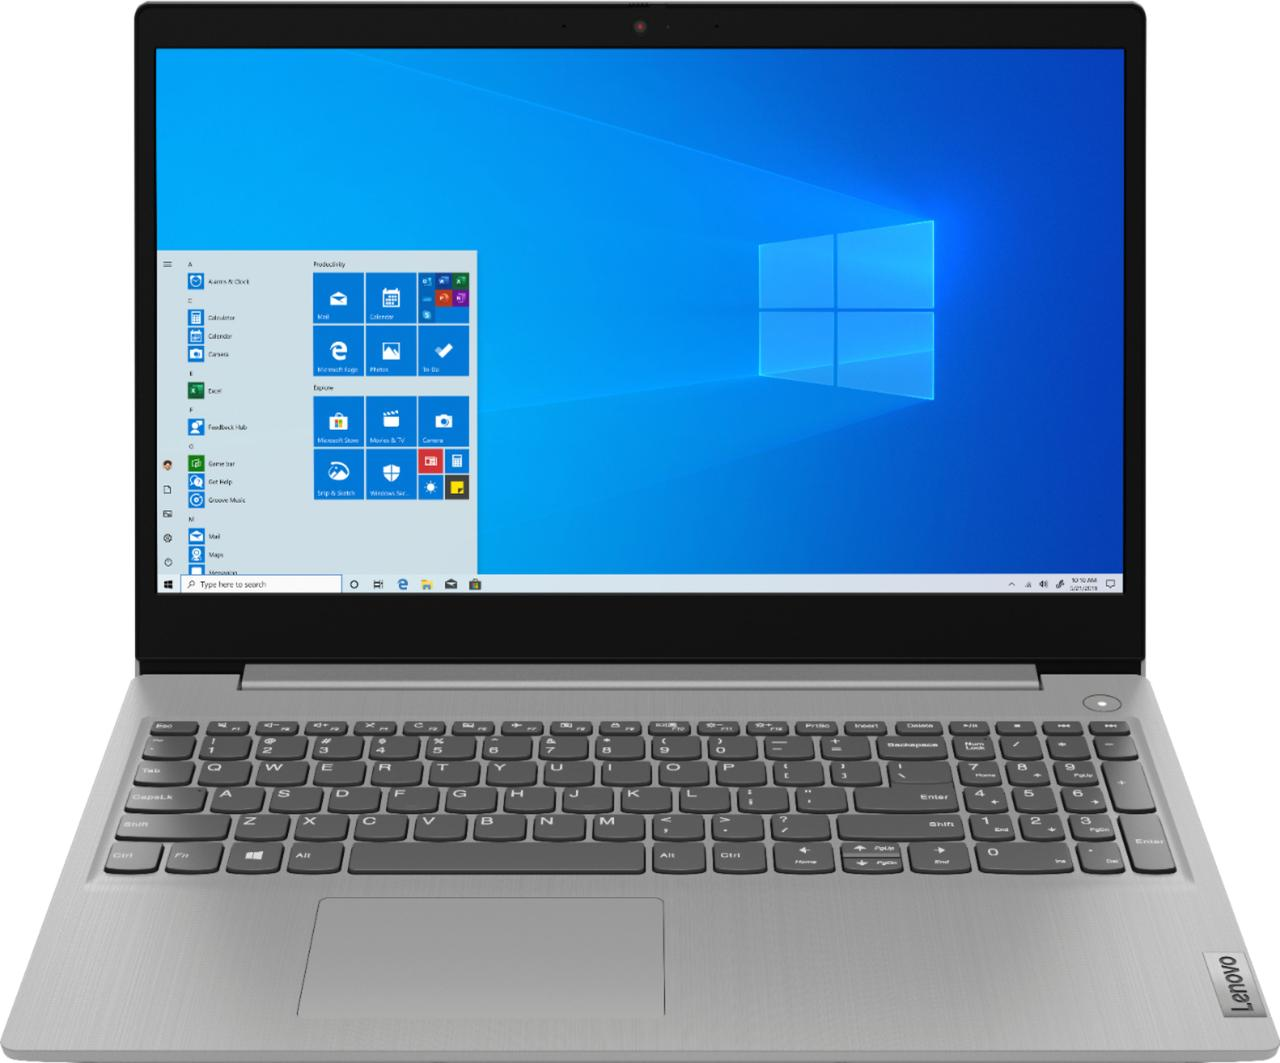 "Lenovo Ideapad 3 15 15.6"" Laptop - AMD Ryzen 3 - 8GB - 81W1018XUS"